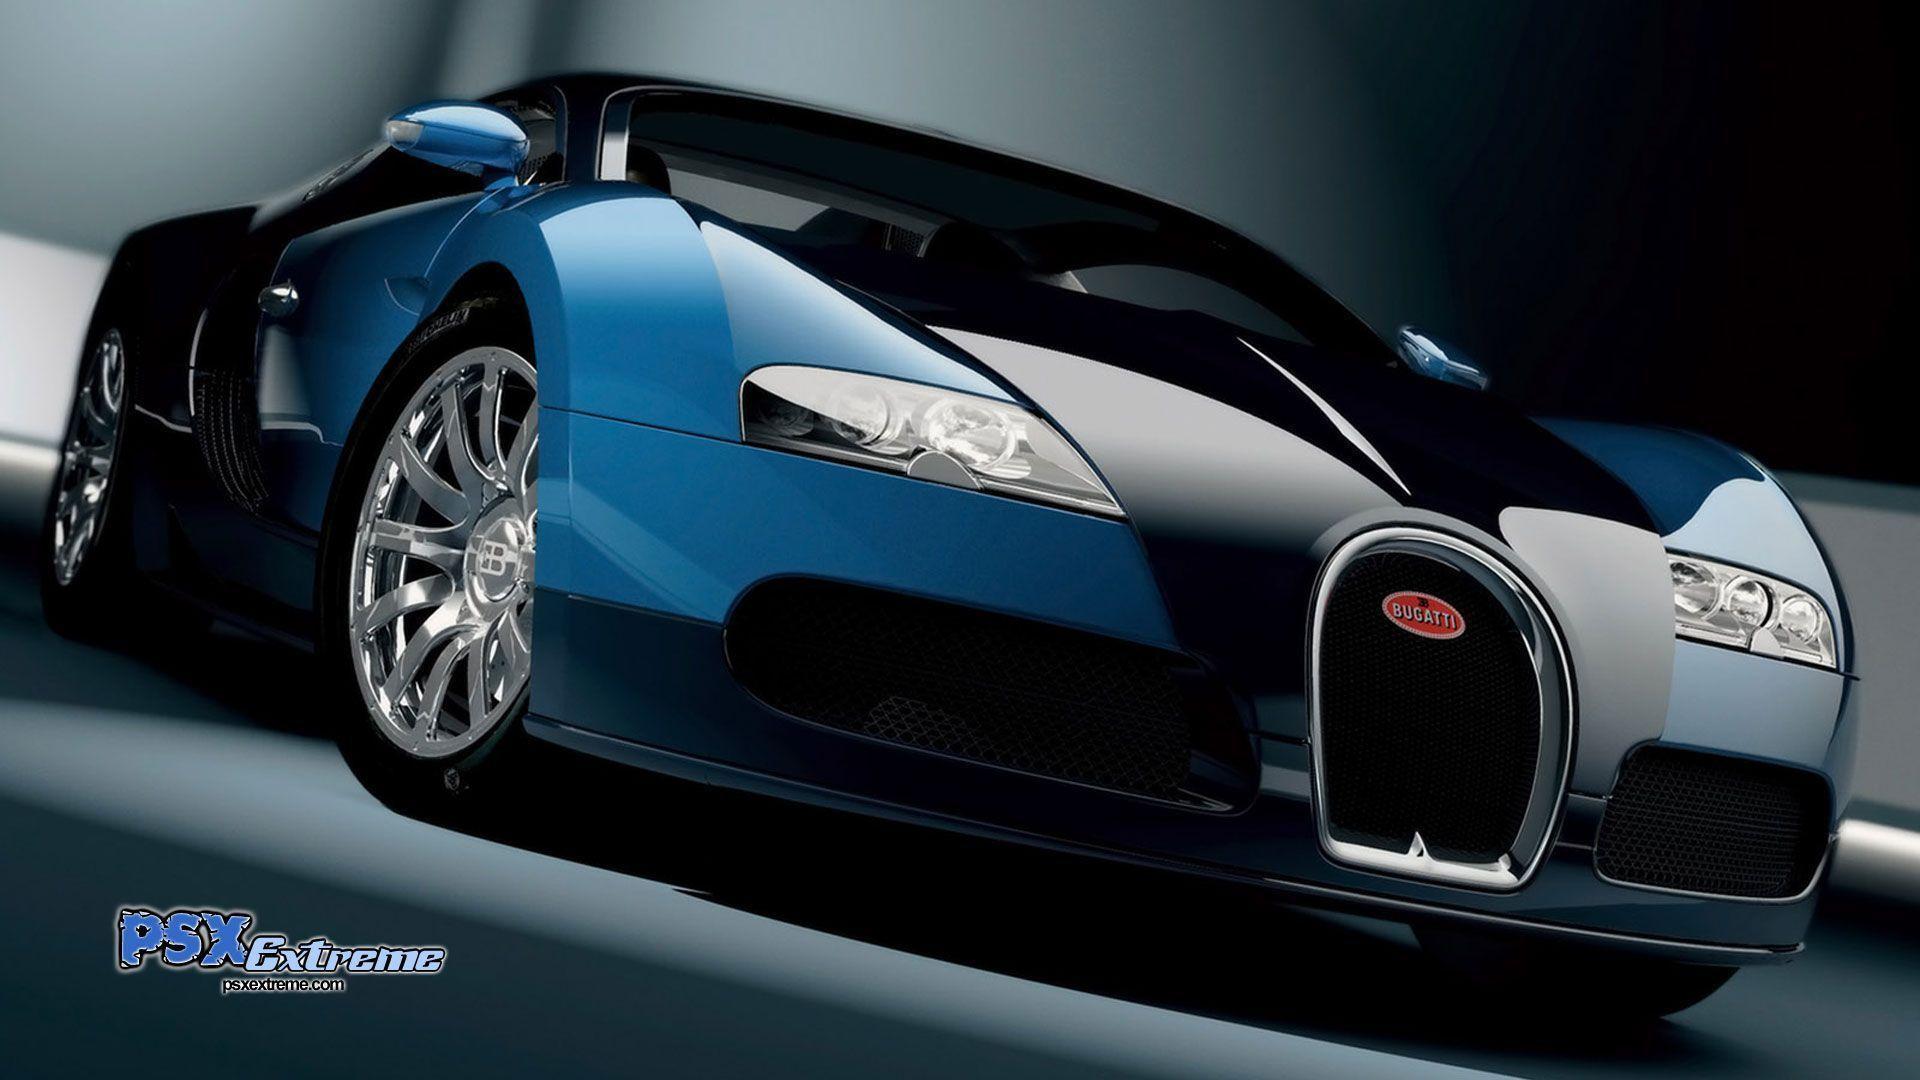 bugatti veyron wallpapers hd wallpaper cave. Black Bedroom Furniture Sets. Home Design Ideas